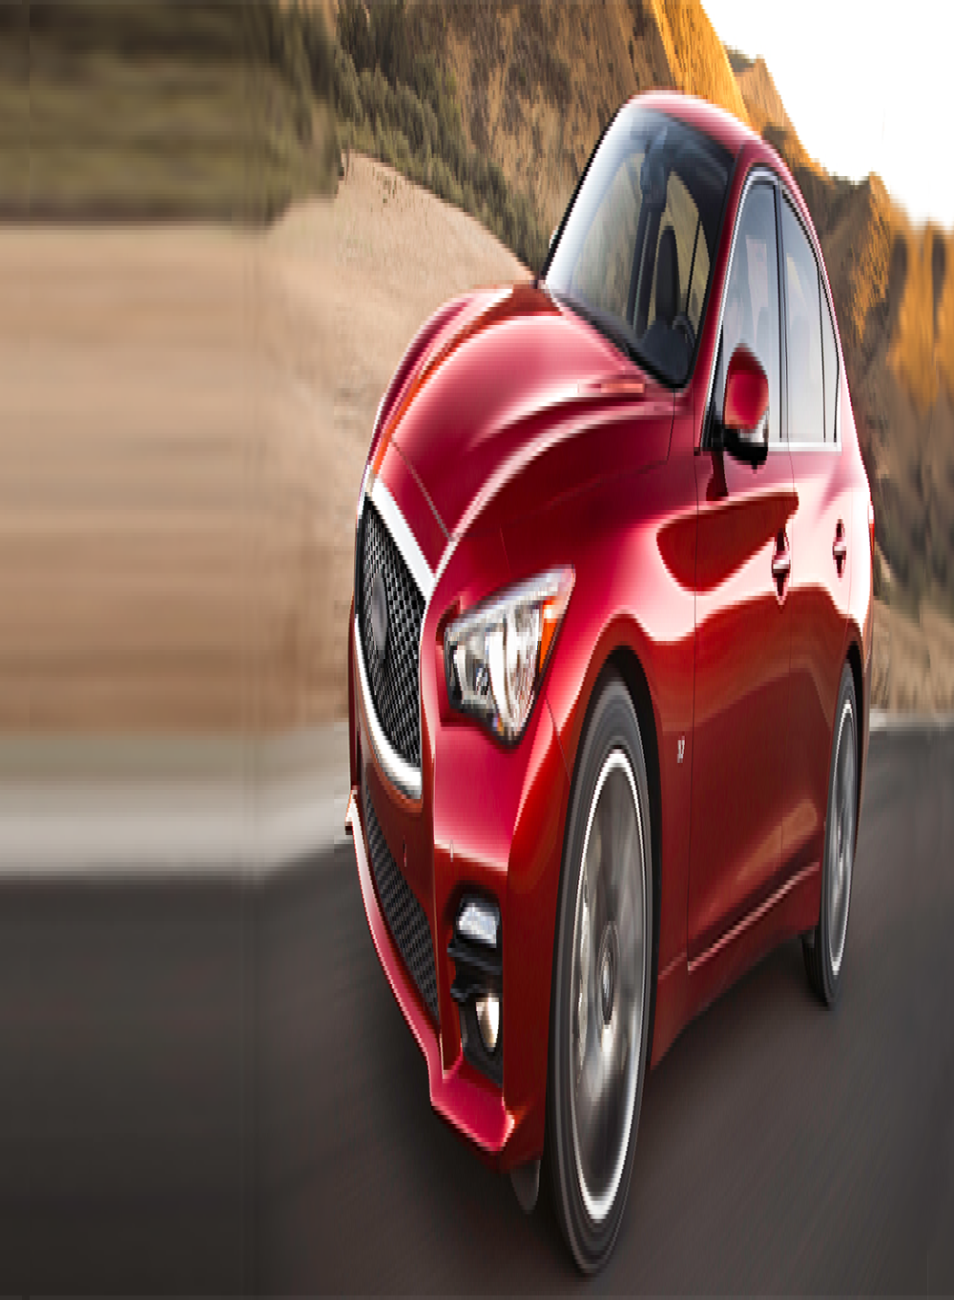 How to be a Smart Car Shopper Patrick Bet David